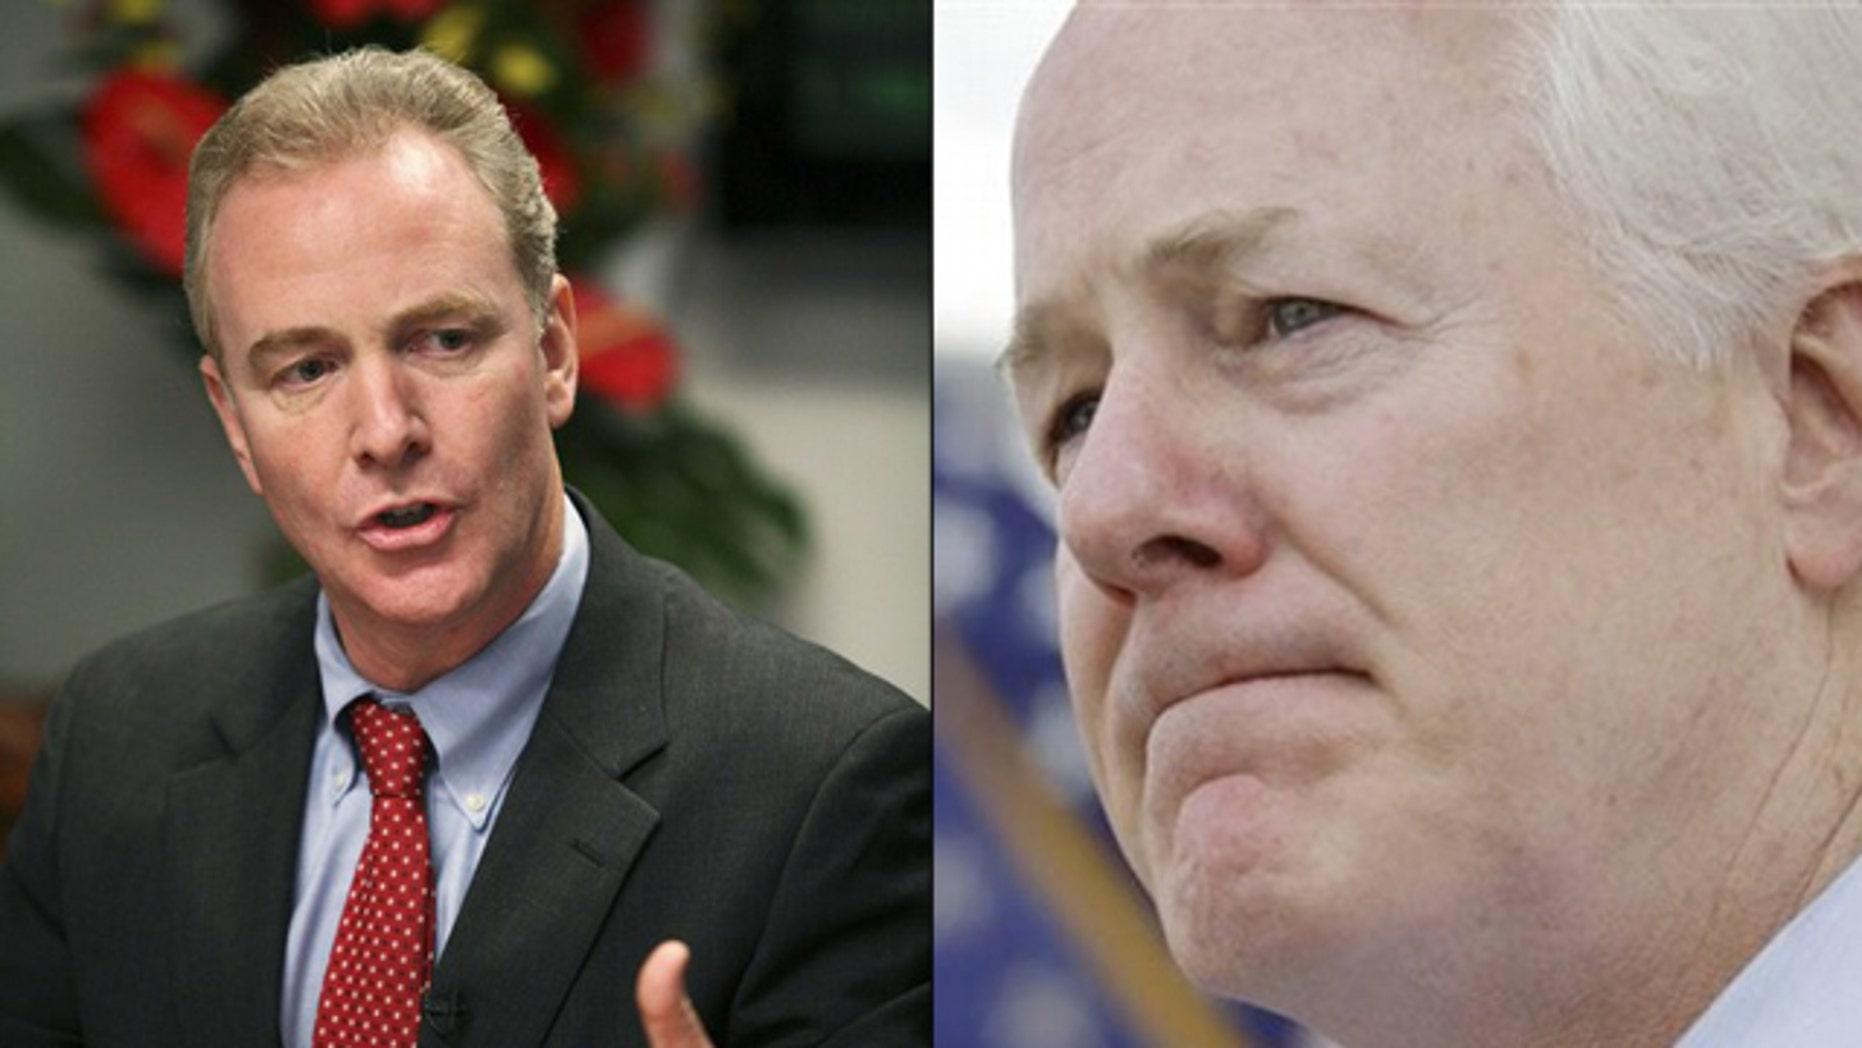 Shown here are Democratic Rep. Chris Van Hollen, left, and Republican Sen. John Cornyn. (Reuters/AP Photos)